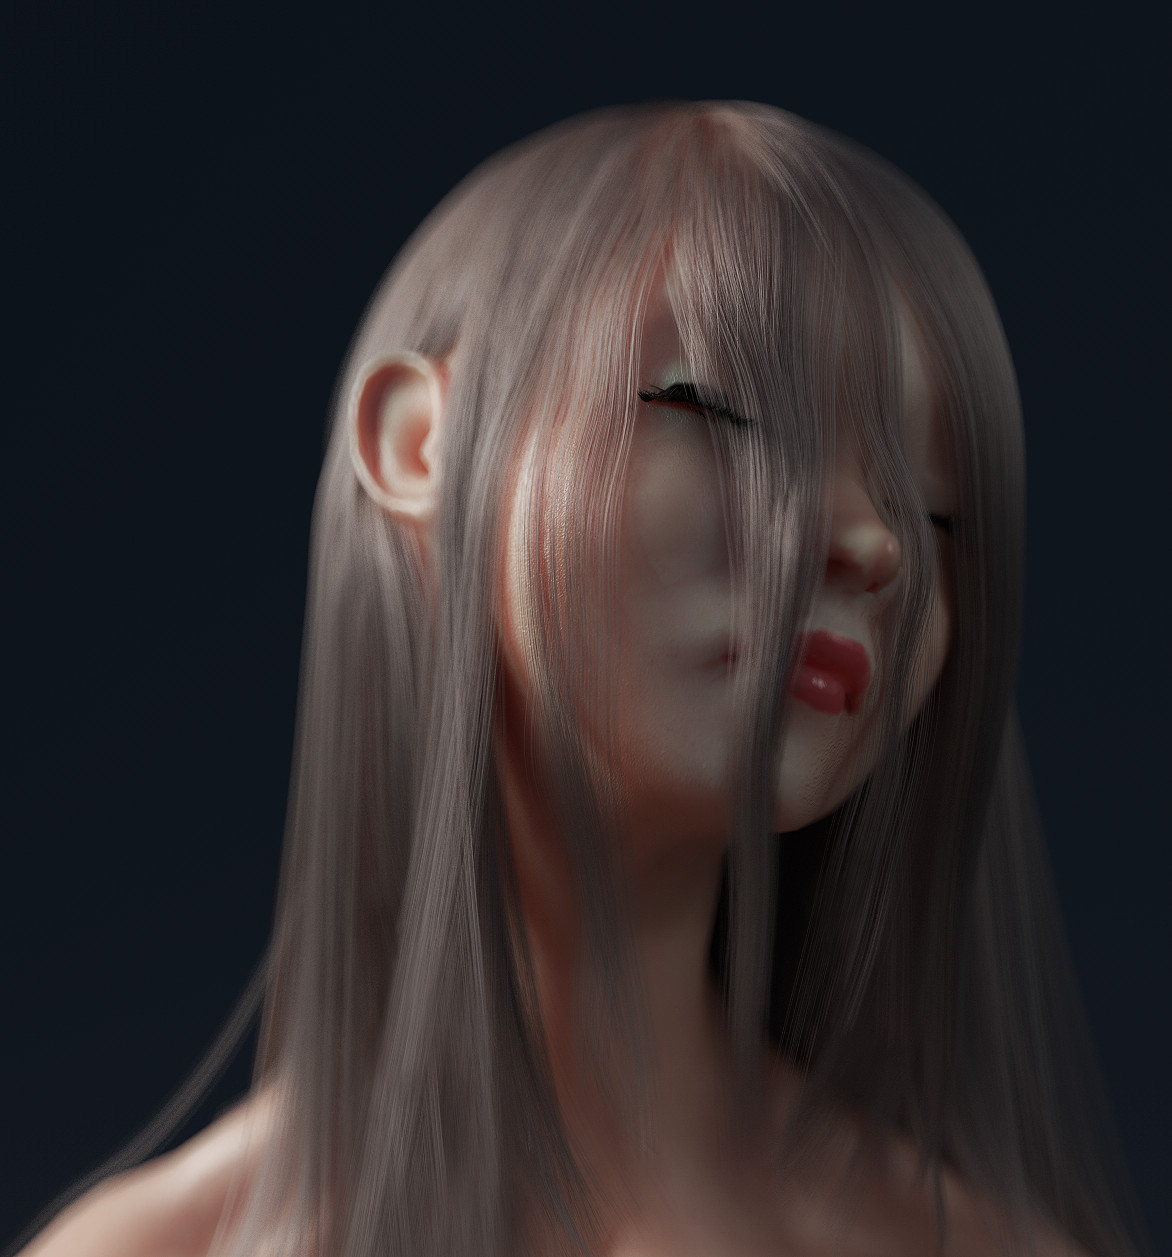 ArtStation - Daily ZBrush Sculpt - Female Portrait, Elijah Sparshott